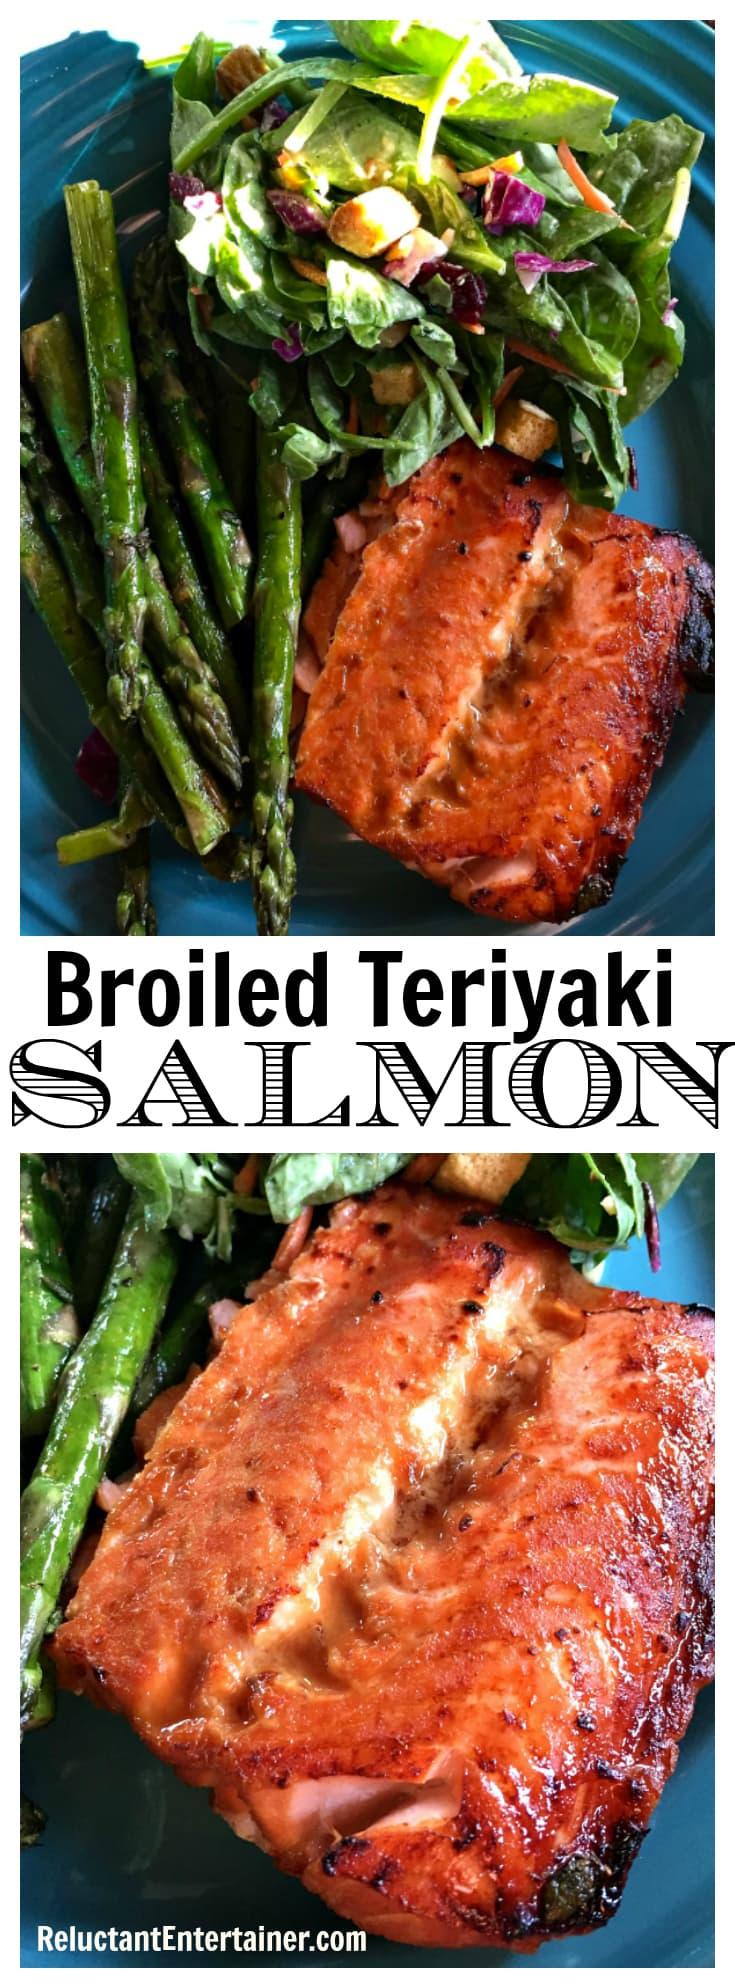 Broiled Teriyaki Salmon